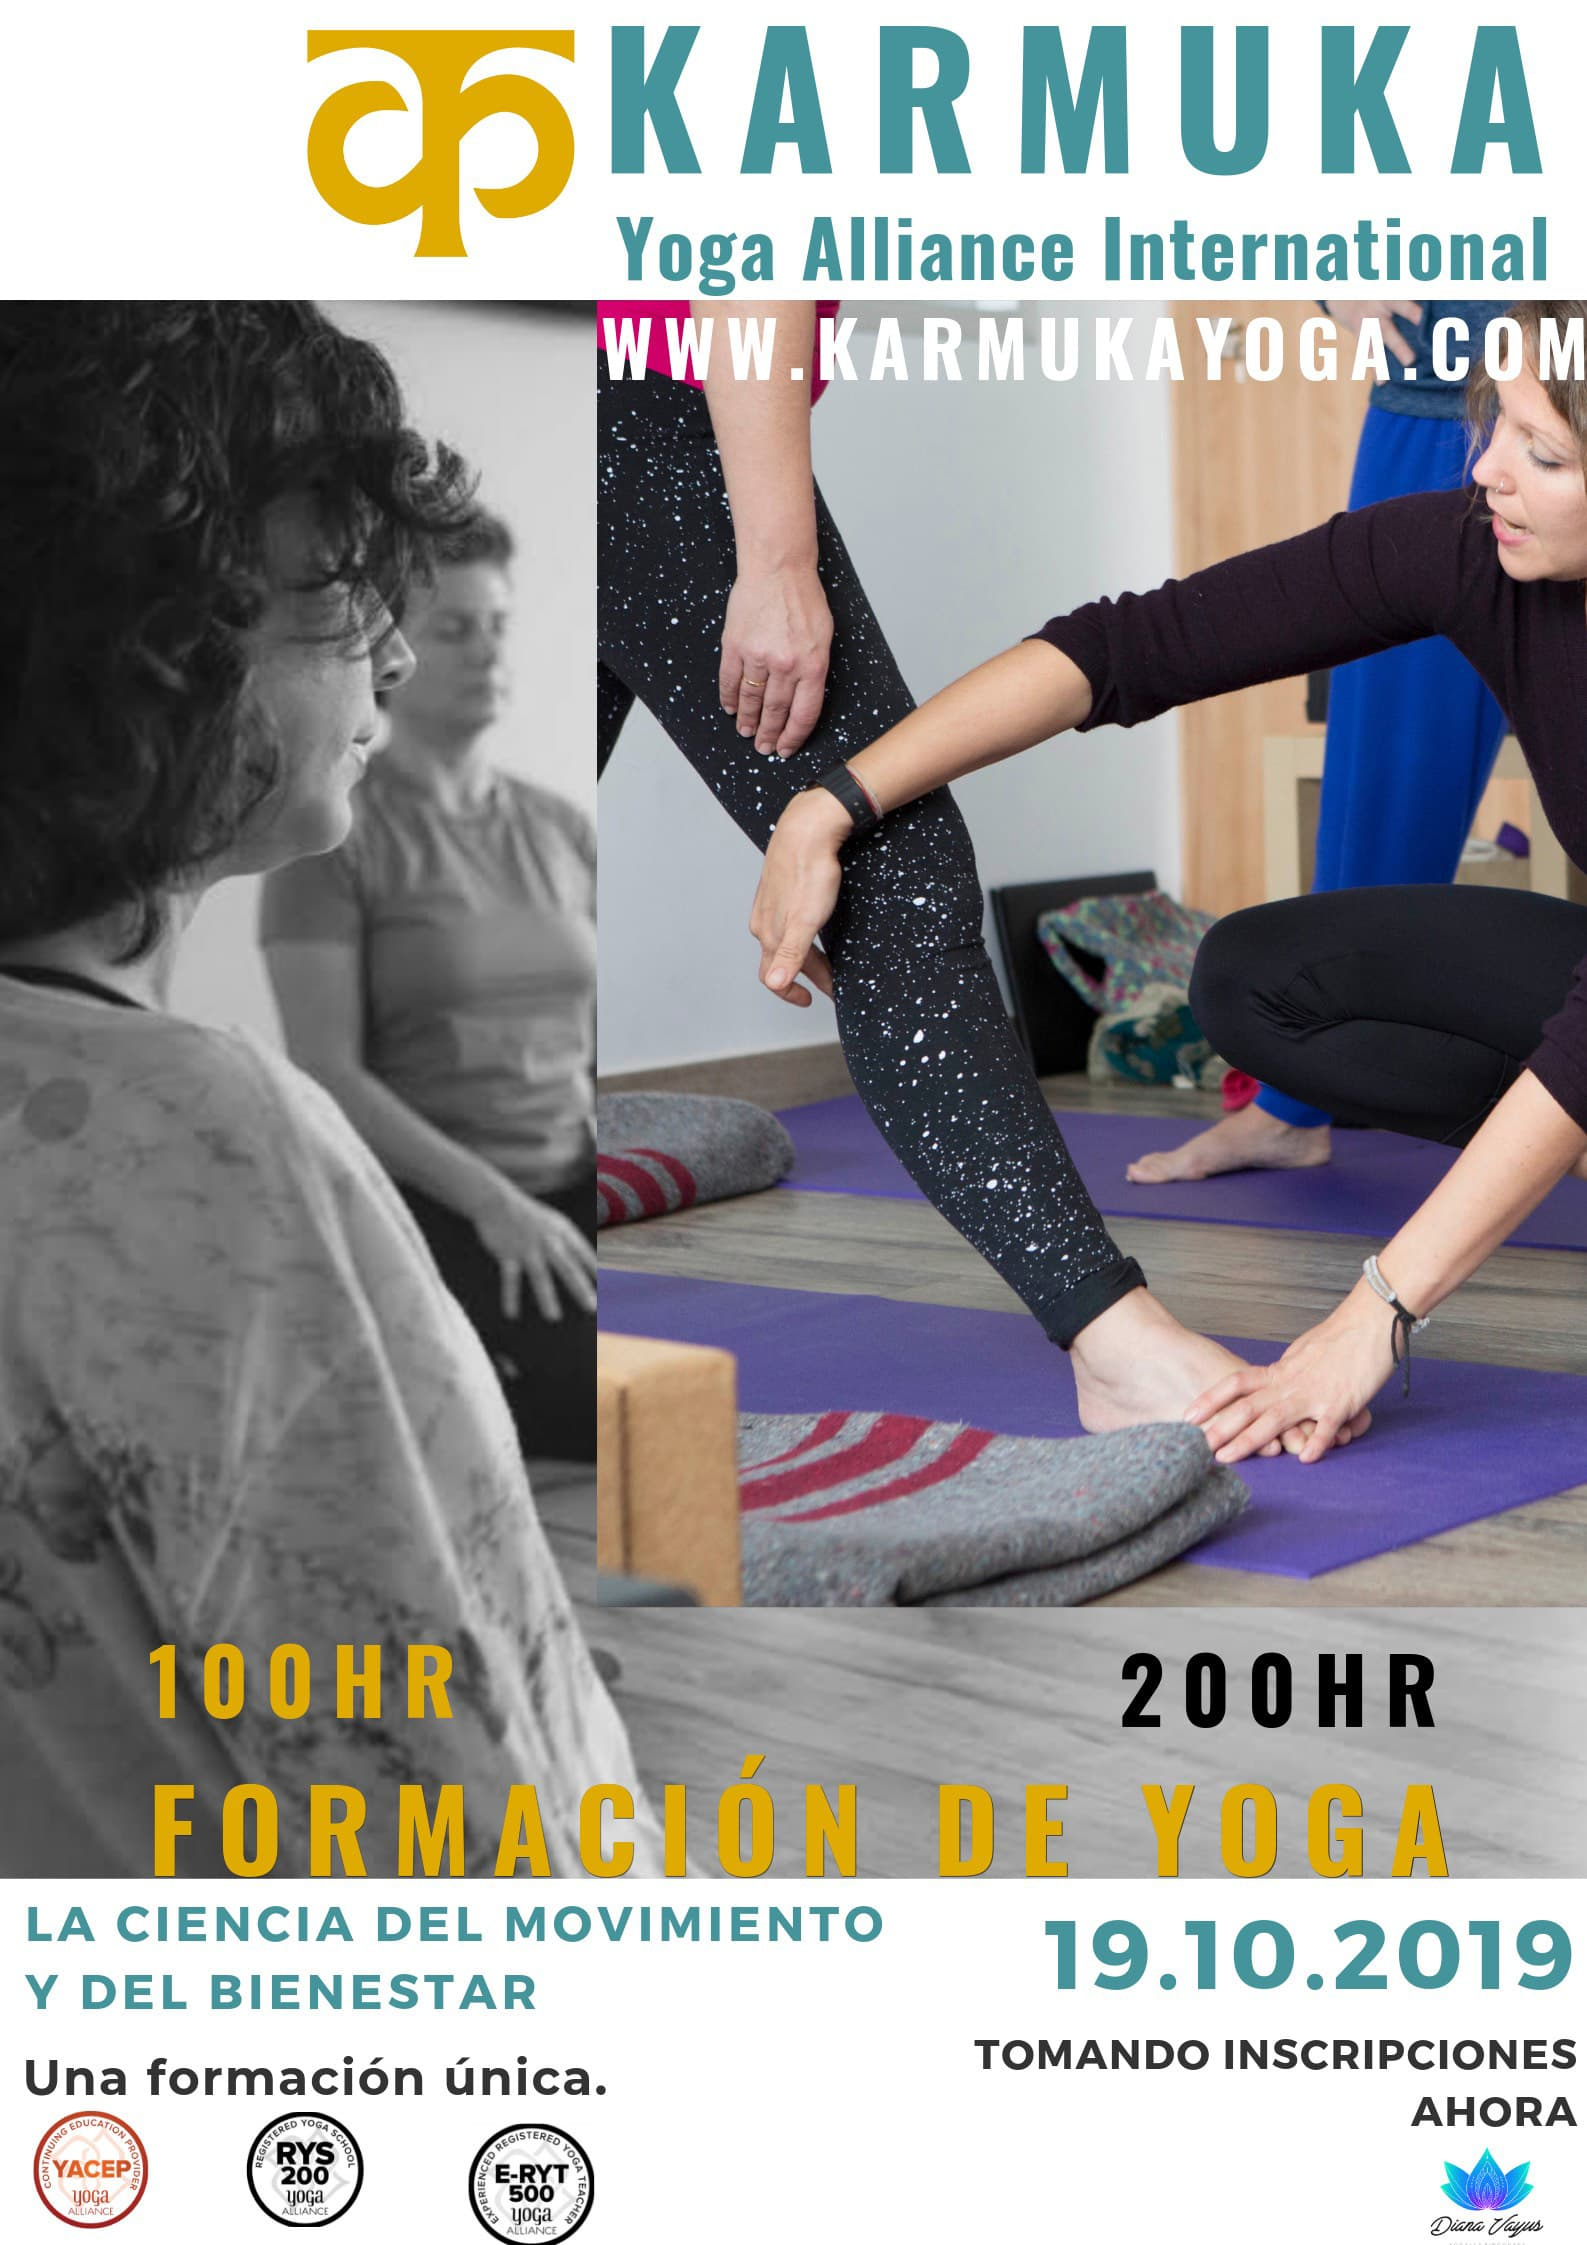 Formaciones - Karmuka Yoga